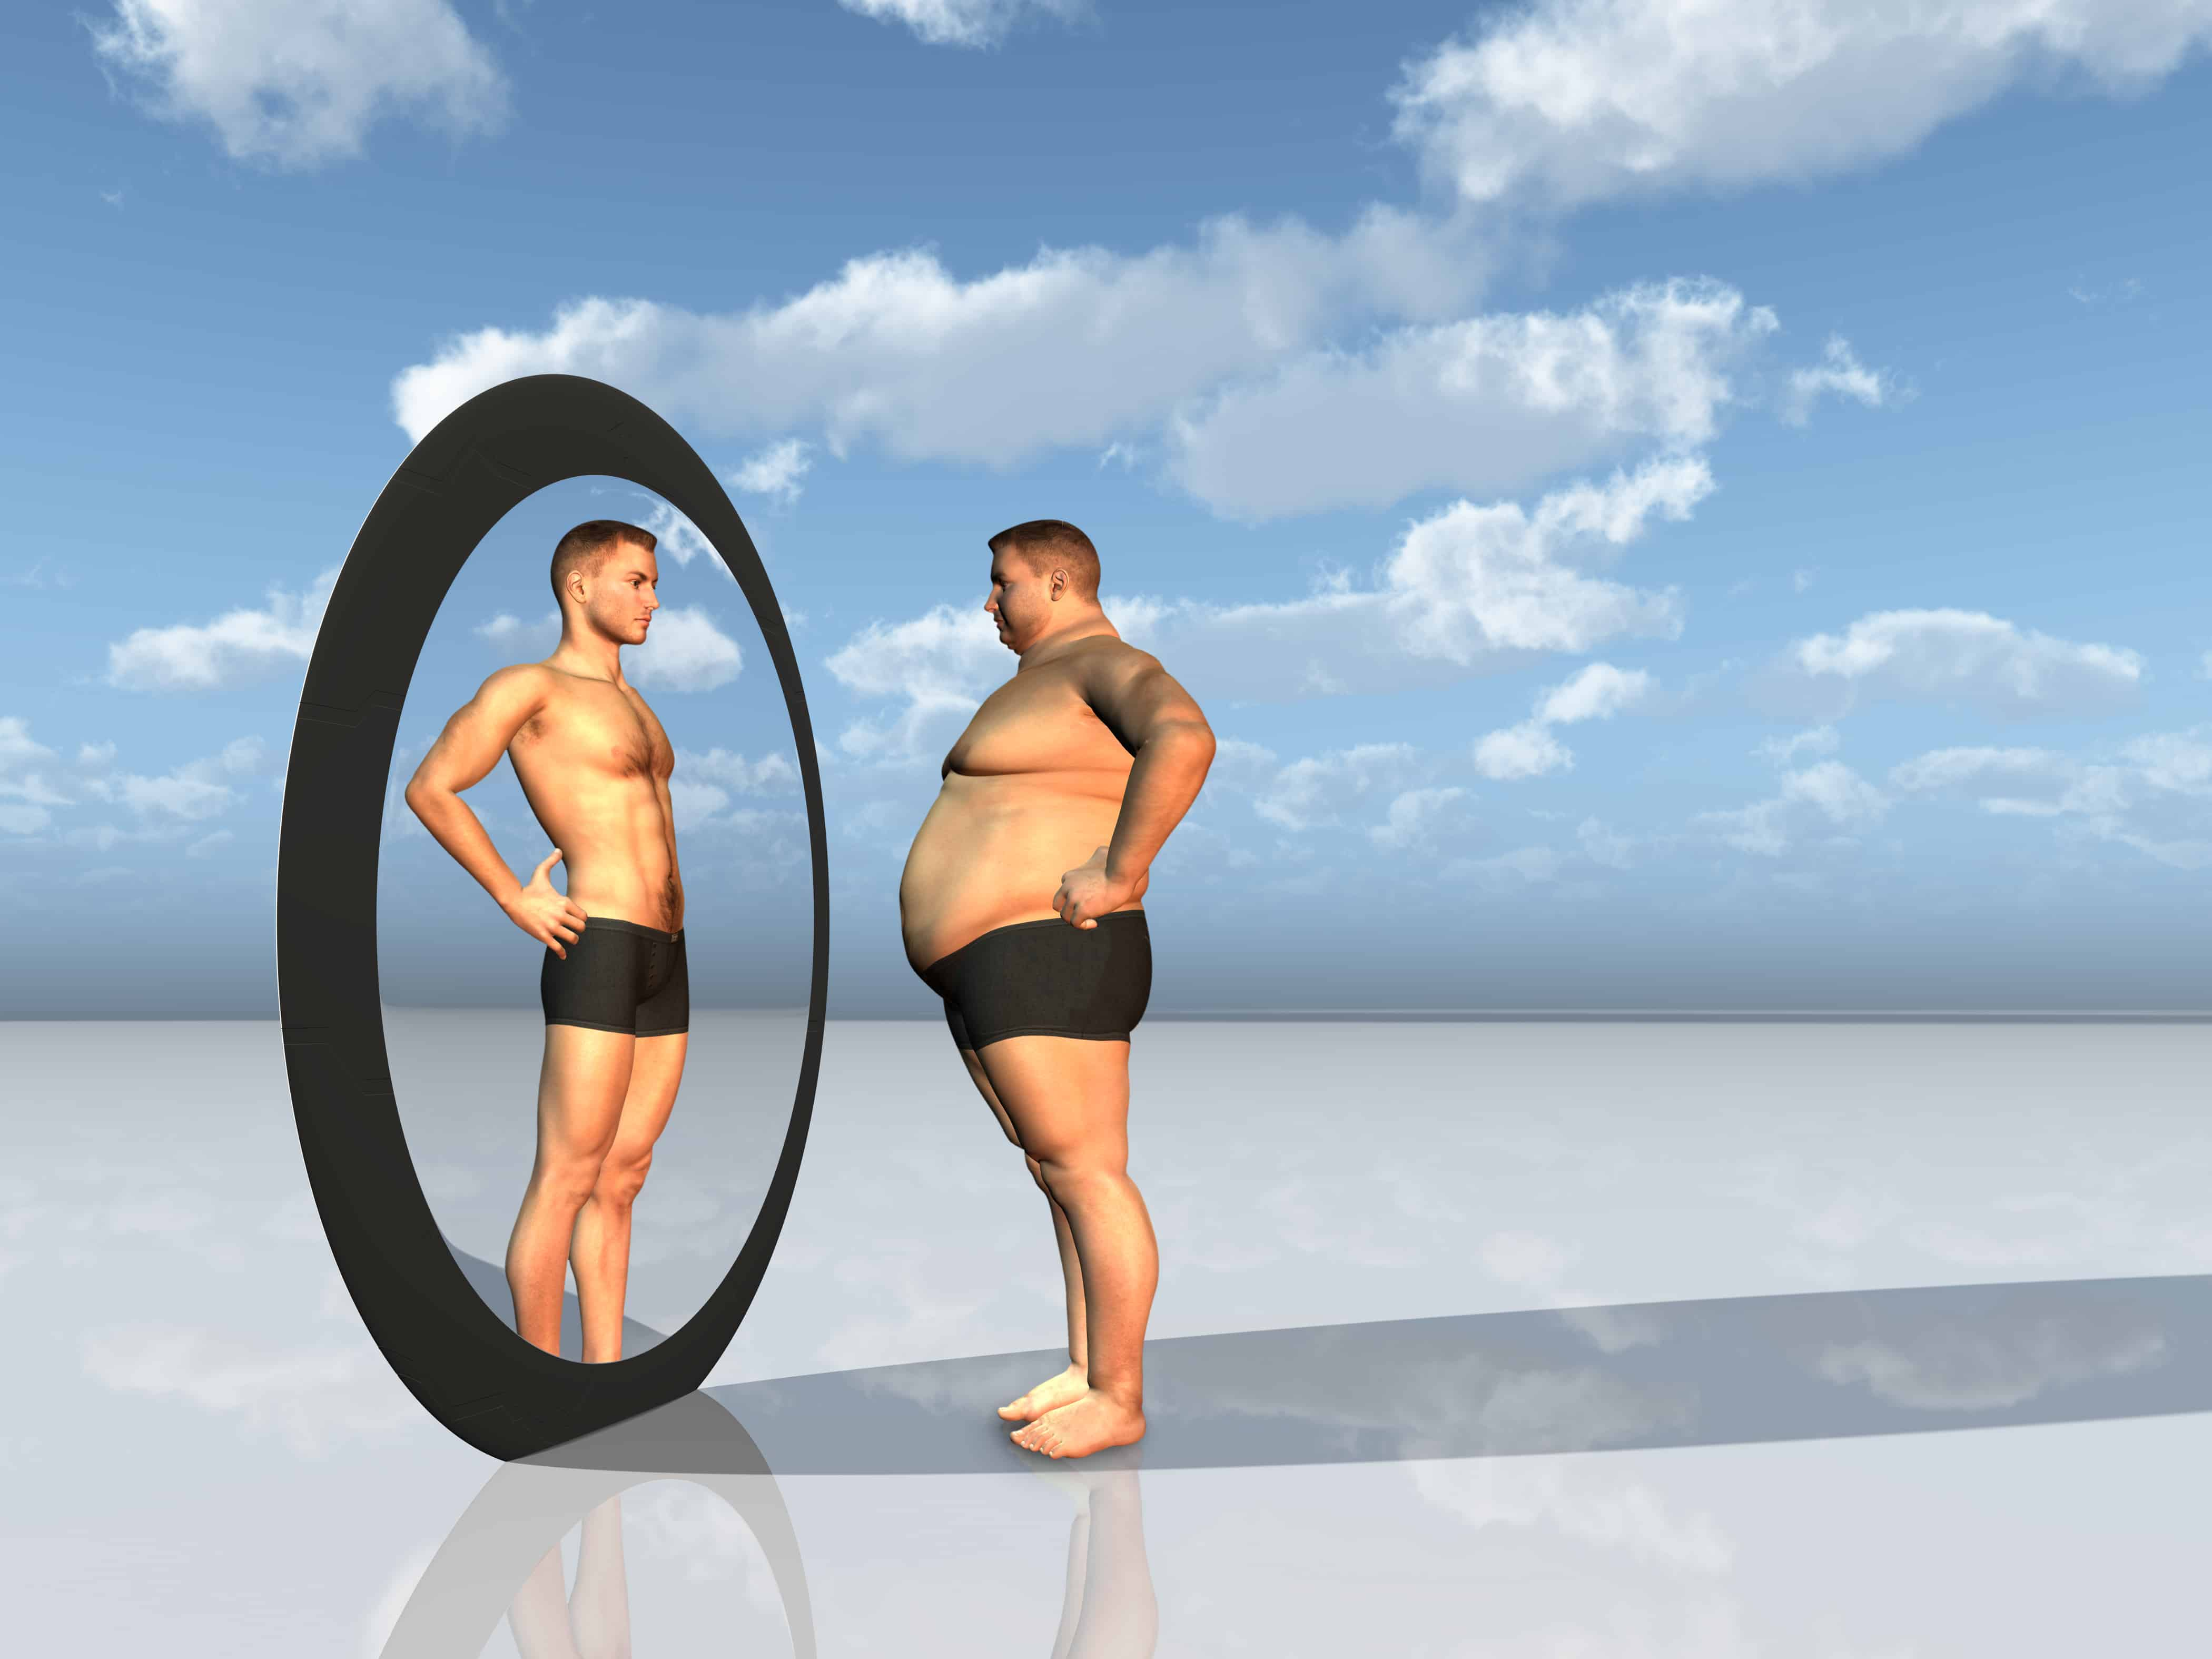 Regain your health with HCG diet plan